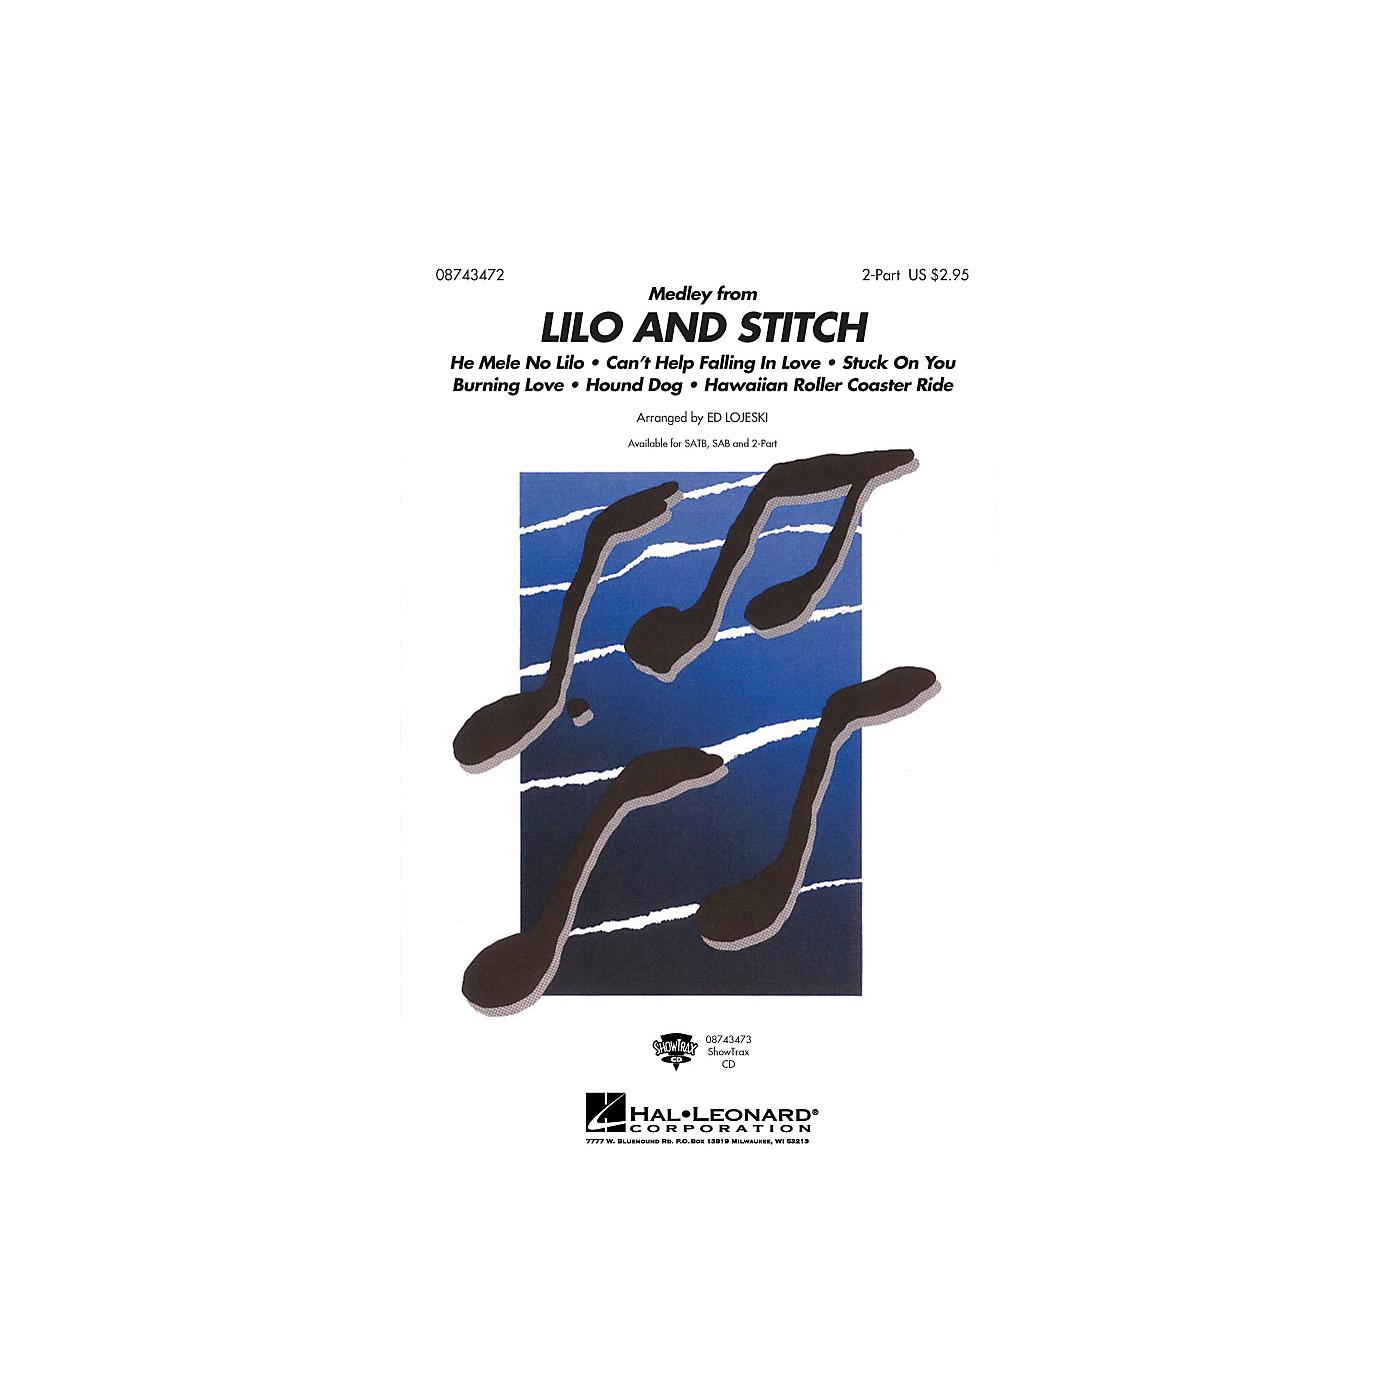 Hal Leonard Lilo and Stitch (Medley) ShowTrax CD Arranged by Ed Lojeski thumbnail